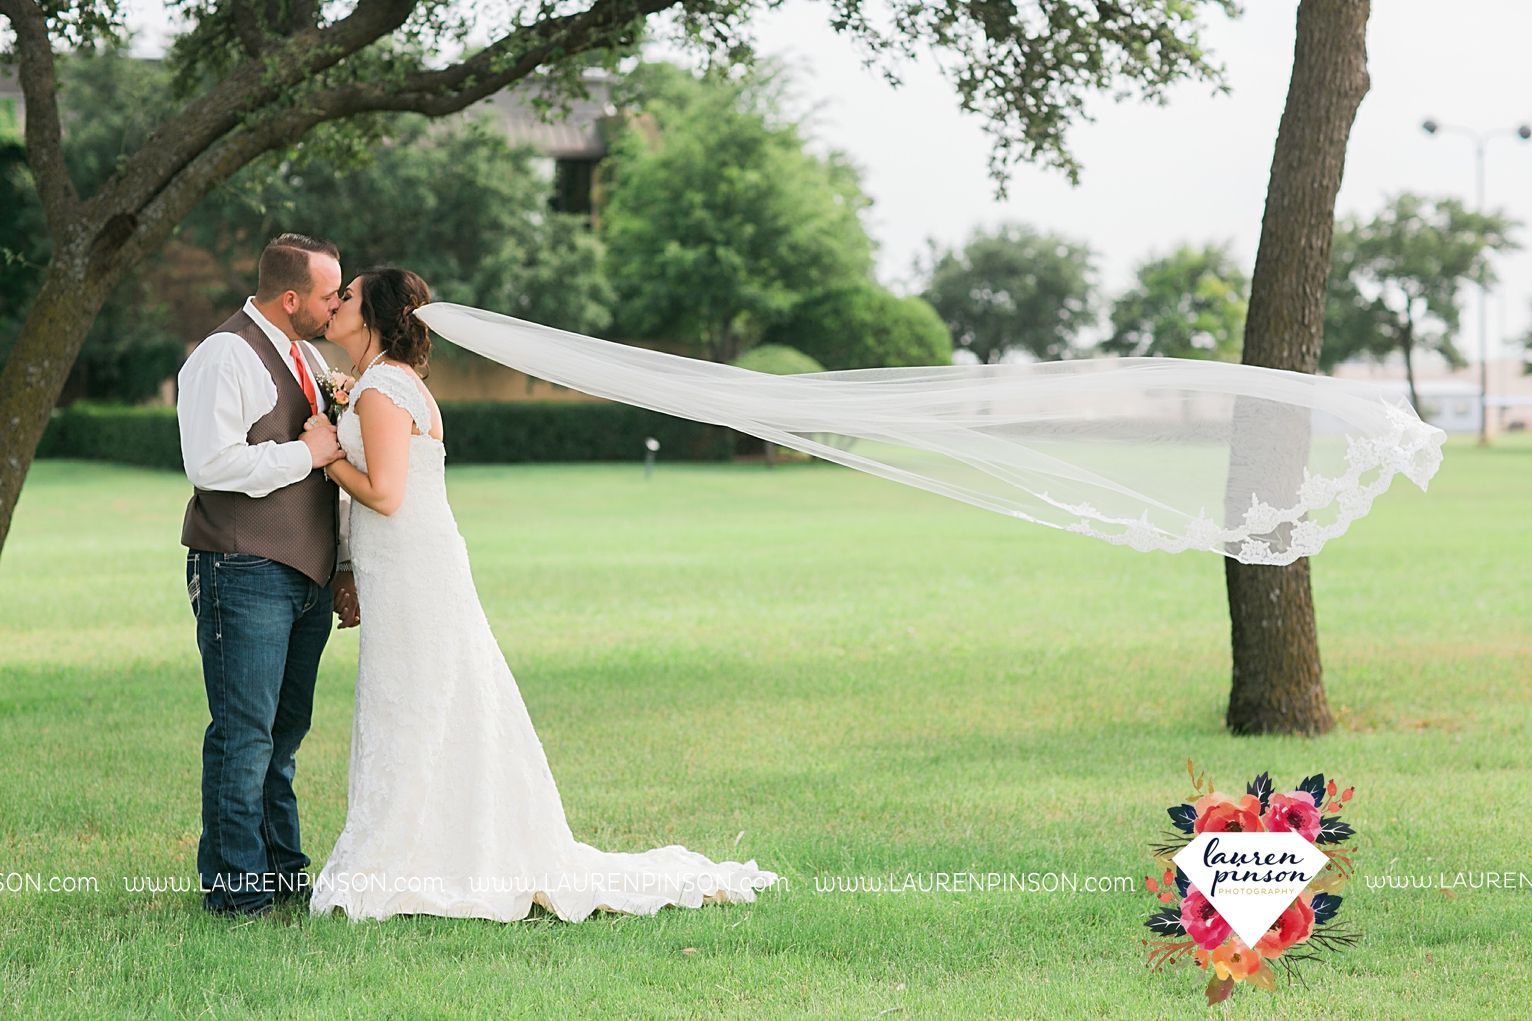 wichita-falls-texas-wedding-photographer-wellington-on-the-lake-with-mayfield-events_2949.jpg